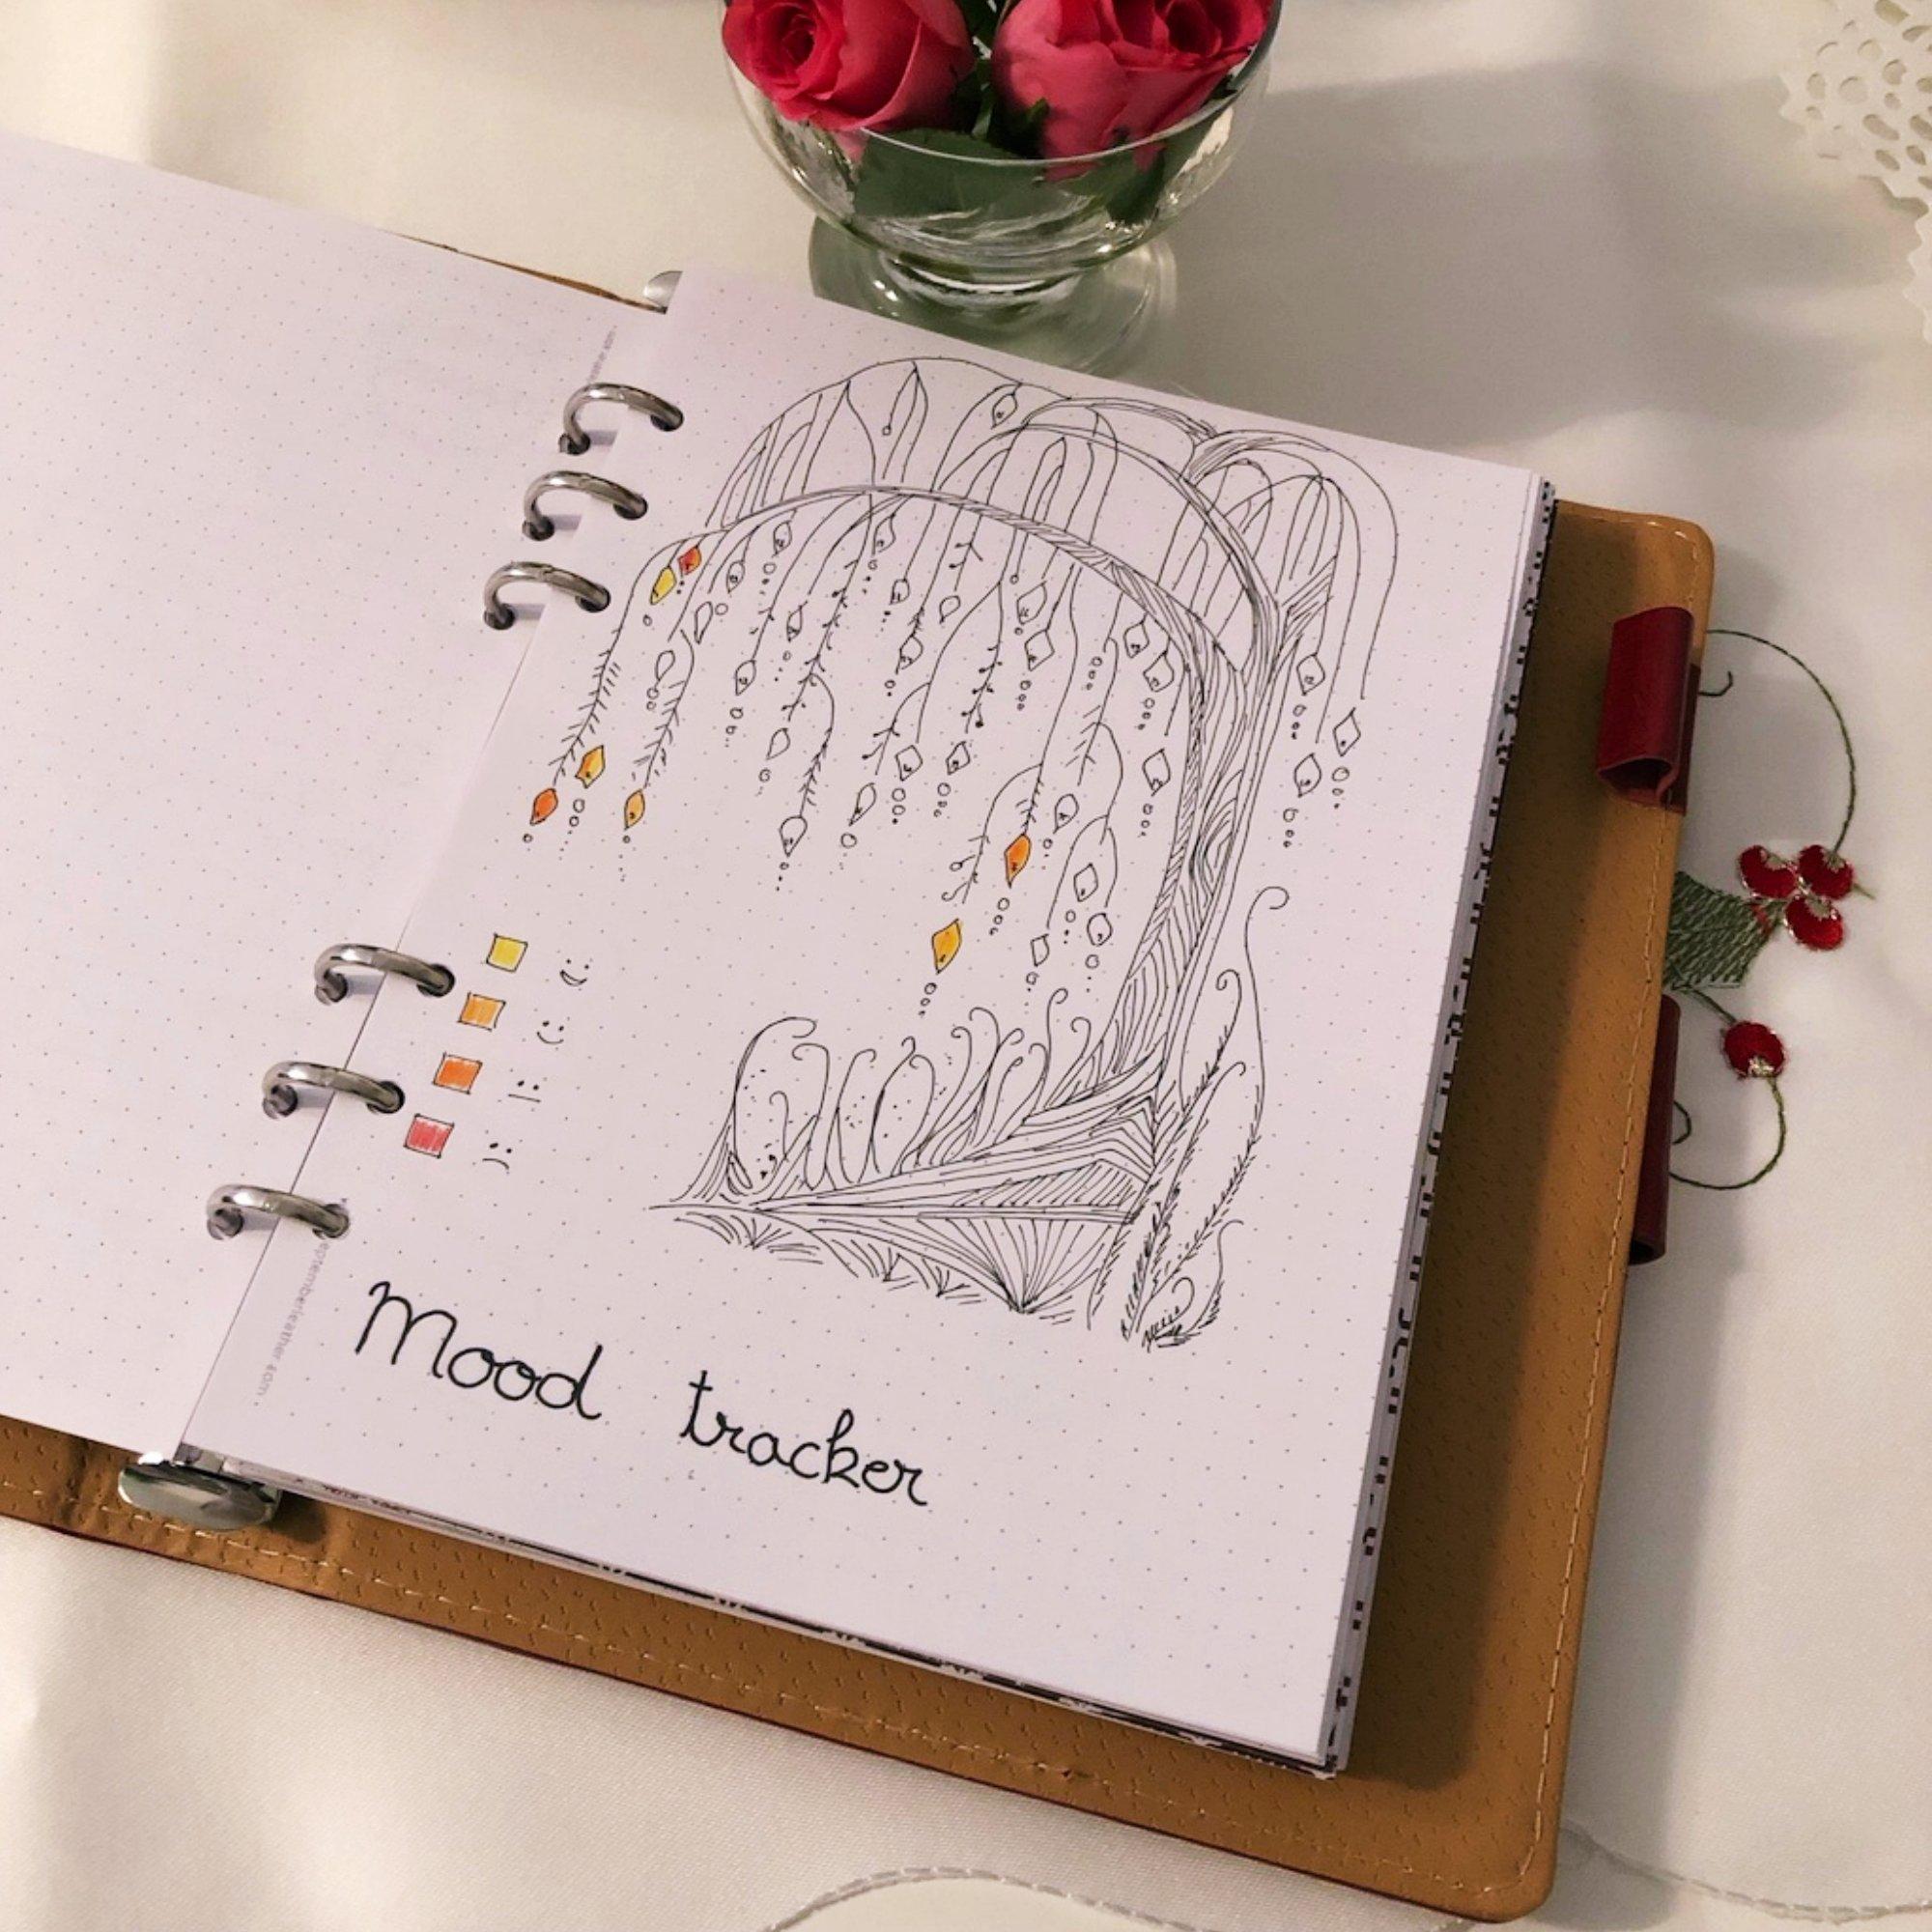 Mood tracker - Willow - itstartswithacoffee.com #moodtracker #tracker #journaling #planning #creativejournal #creativejournaling